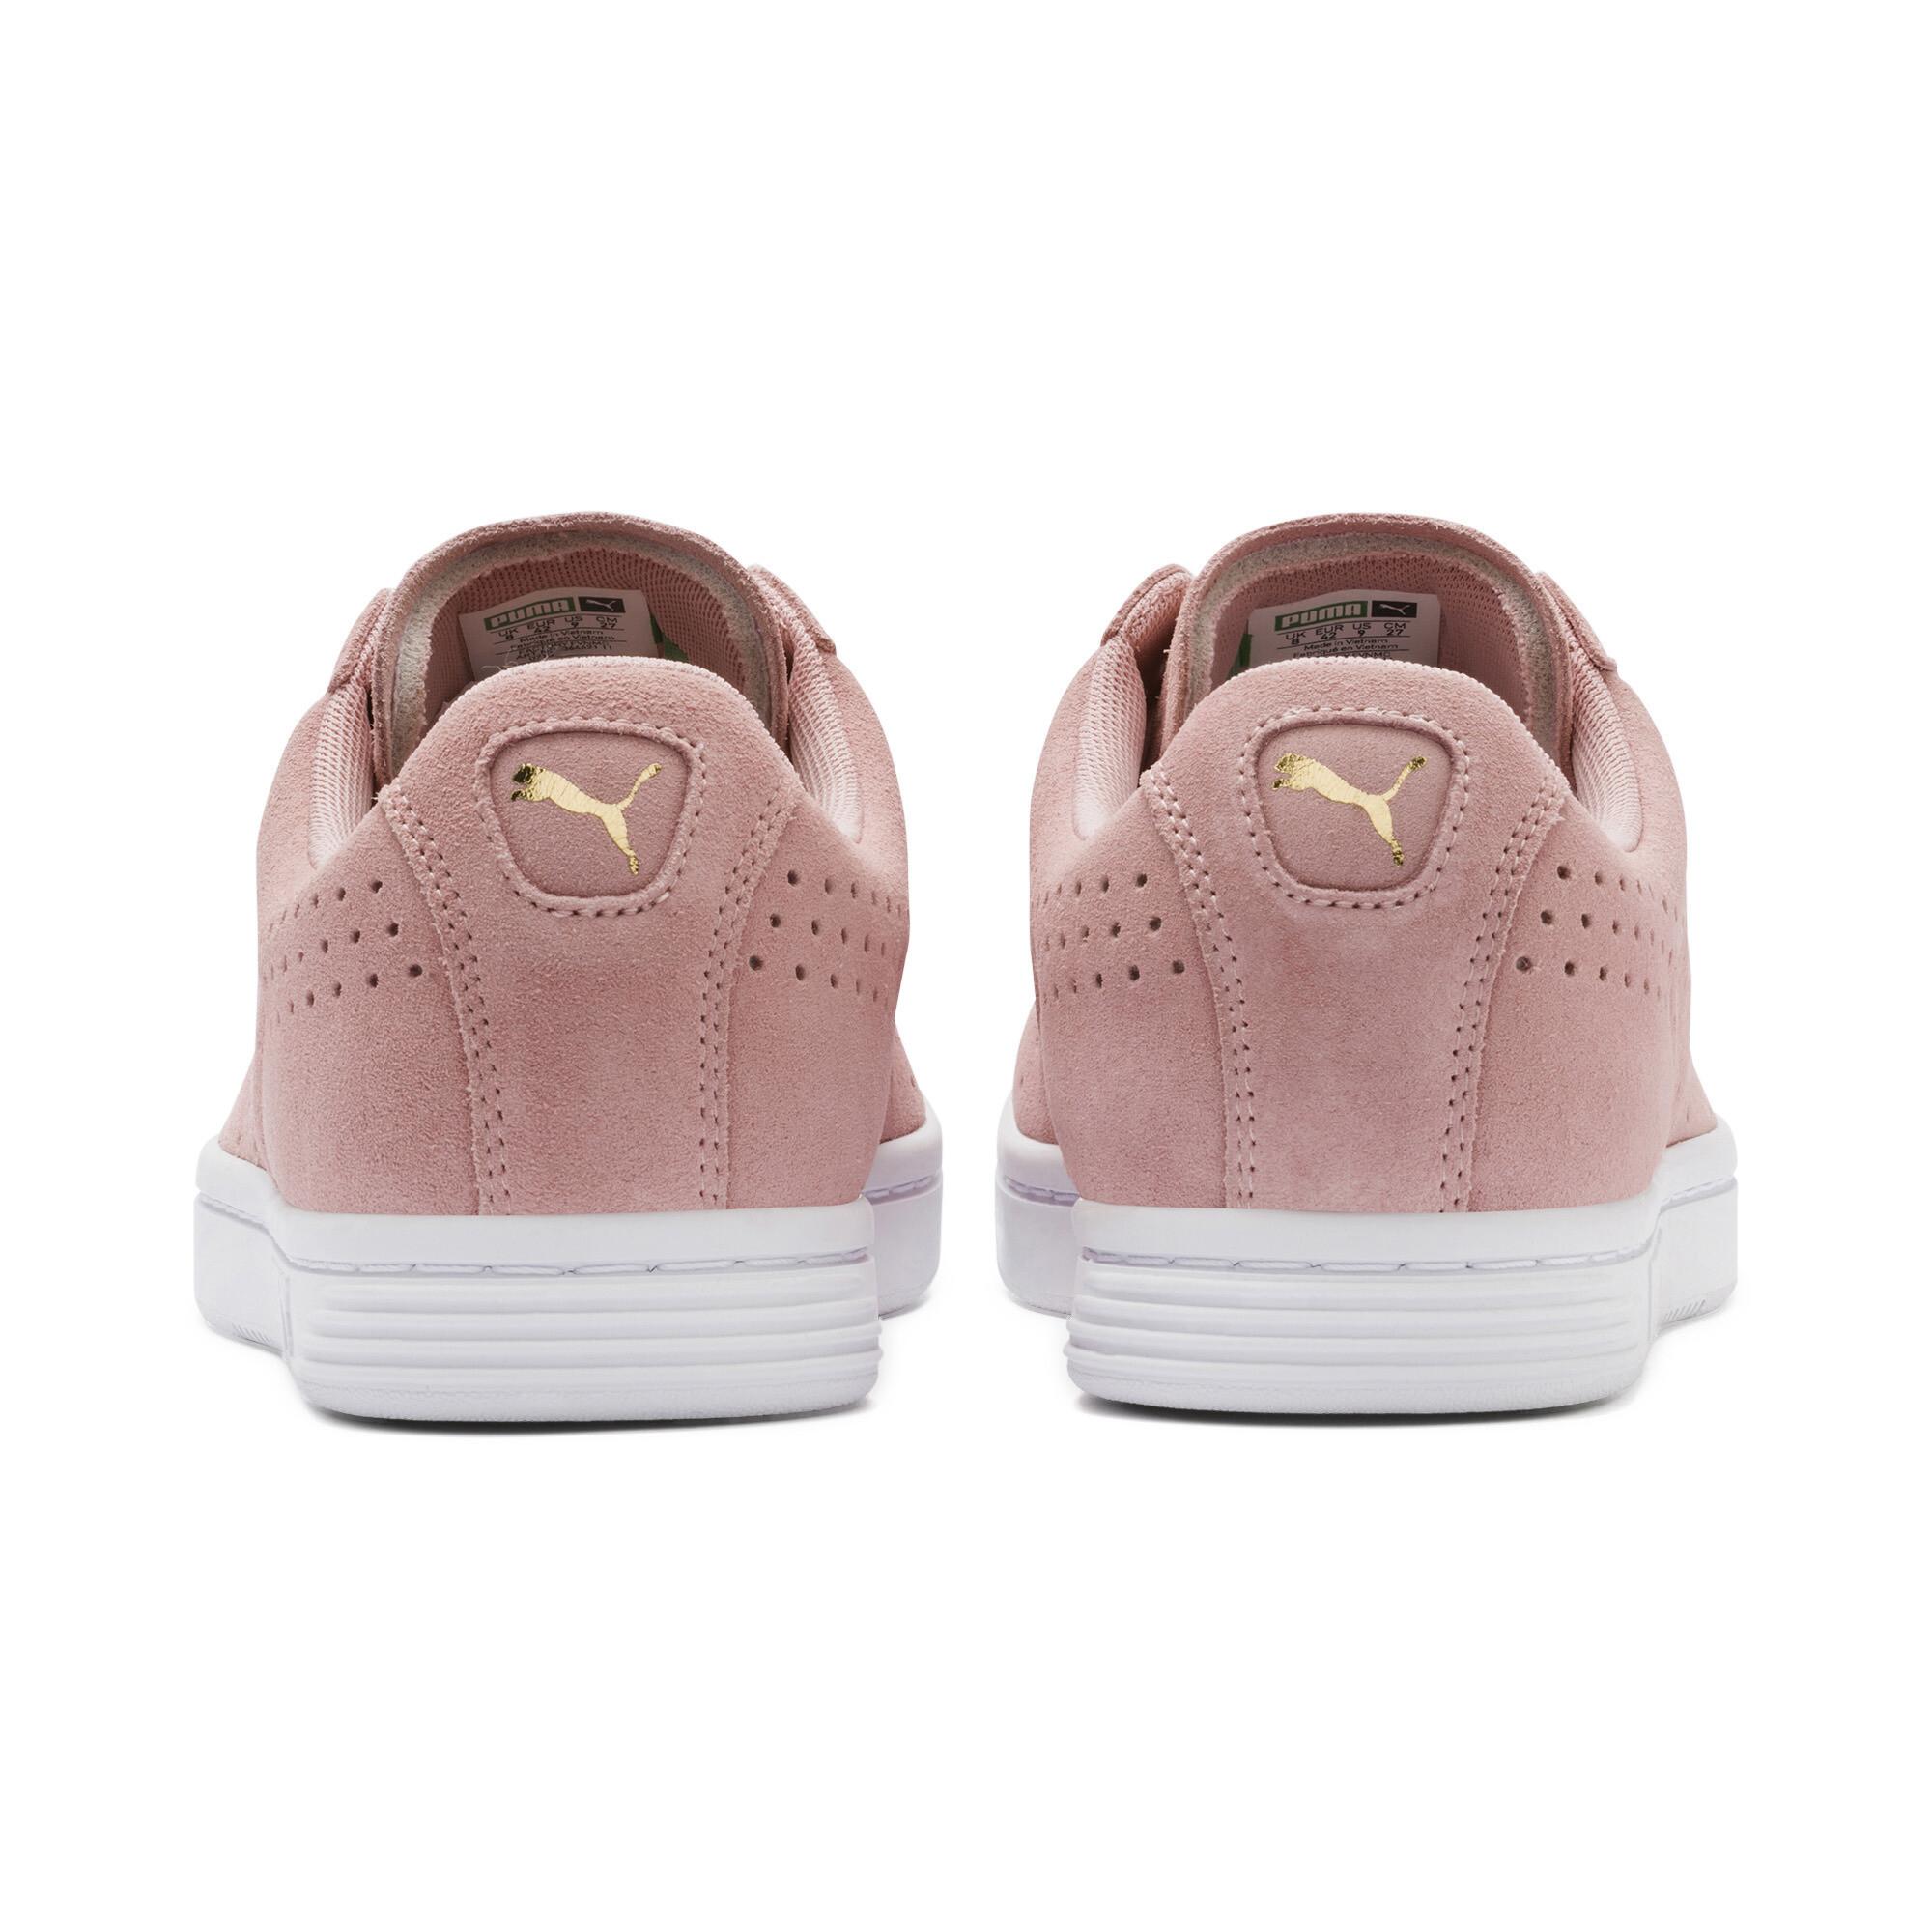 PUMA-Court-Star-Suede-Sneakers-Unisex-Shoe-Sport-Classics thumbnail 3